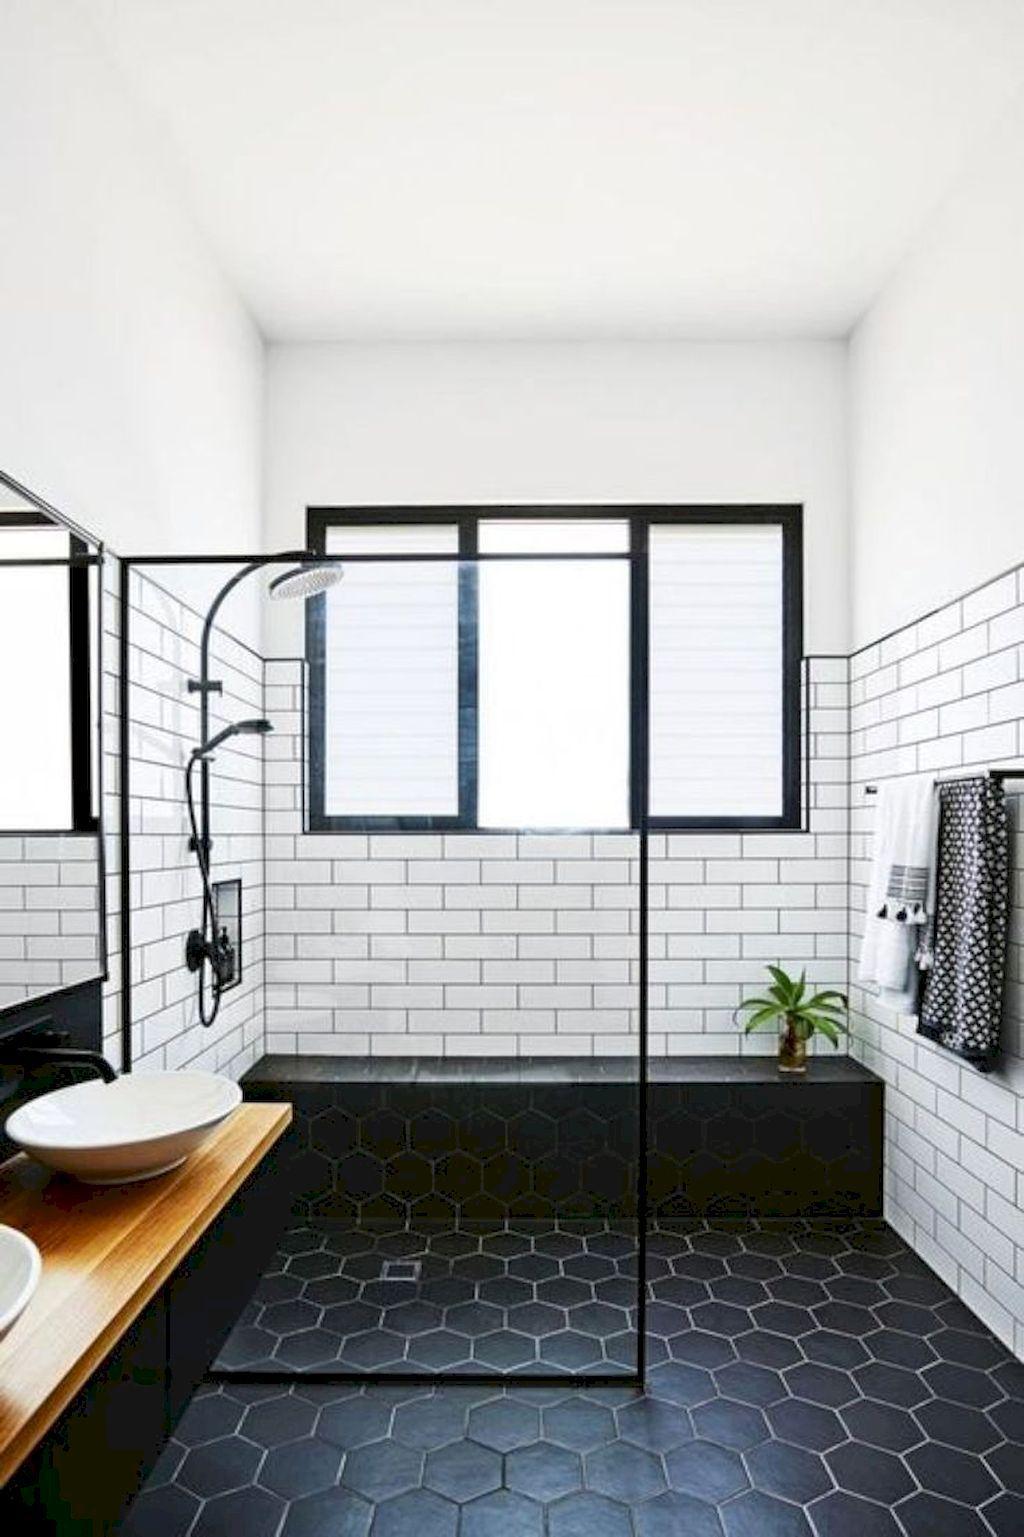 Badideen mit weißen fliesen  small bathroom remodel on a budget for first apartment ideas